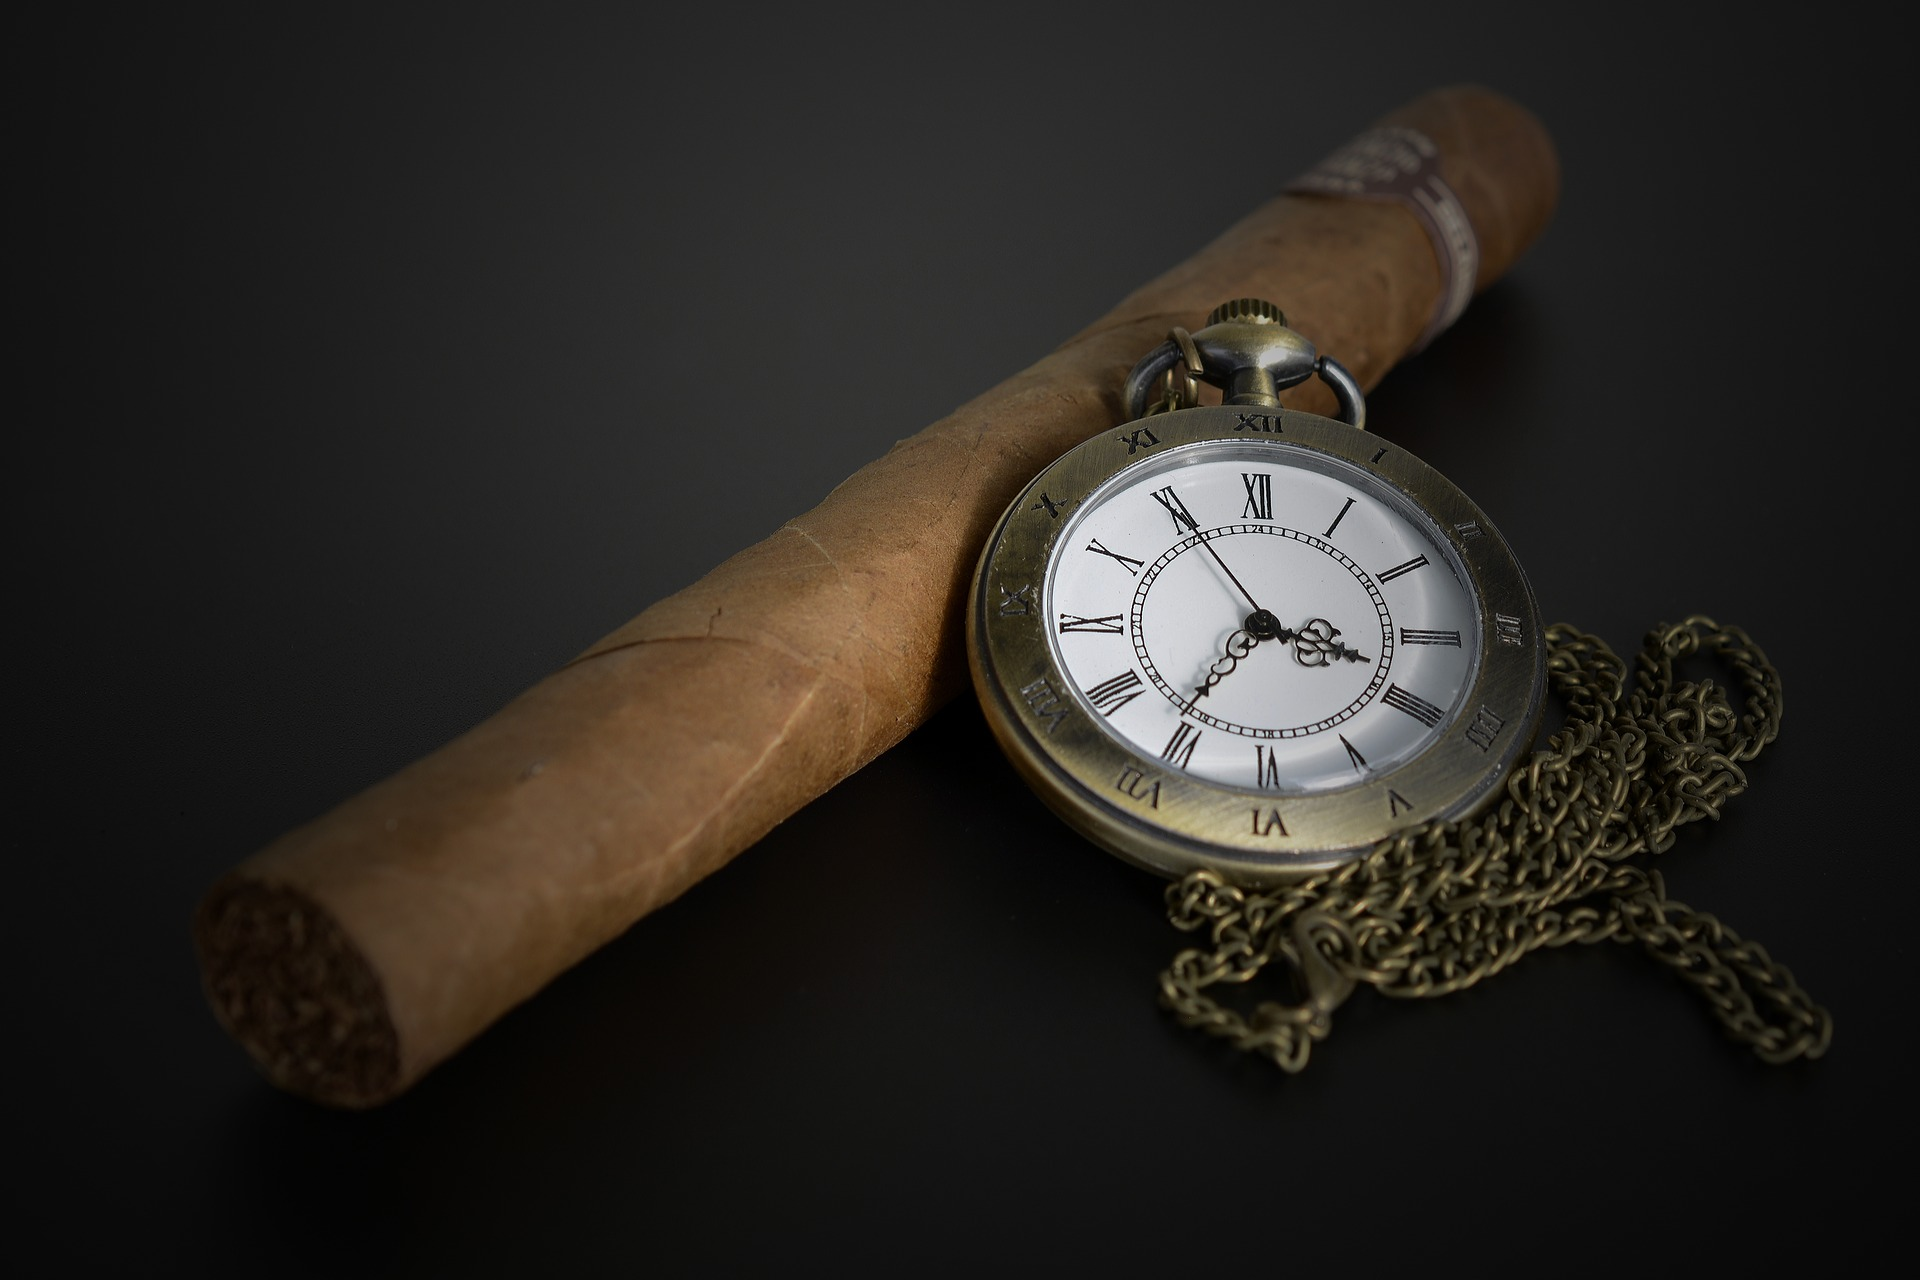 pocket-watch-3156770_1920